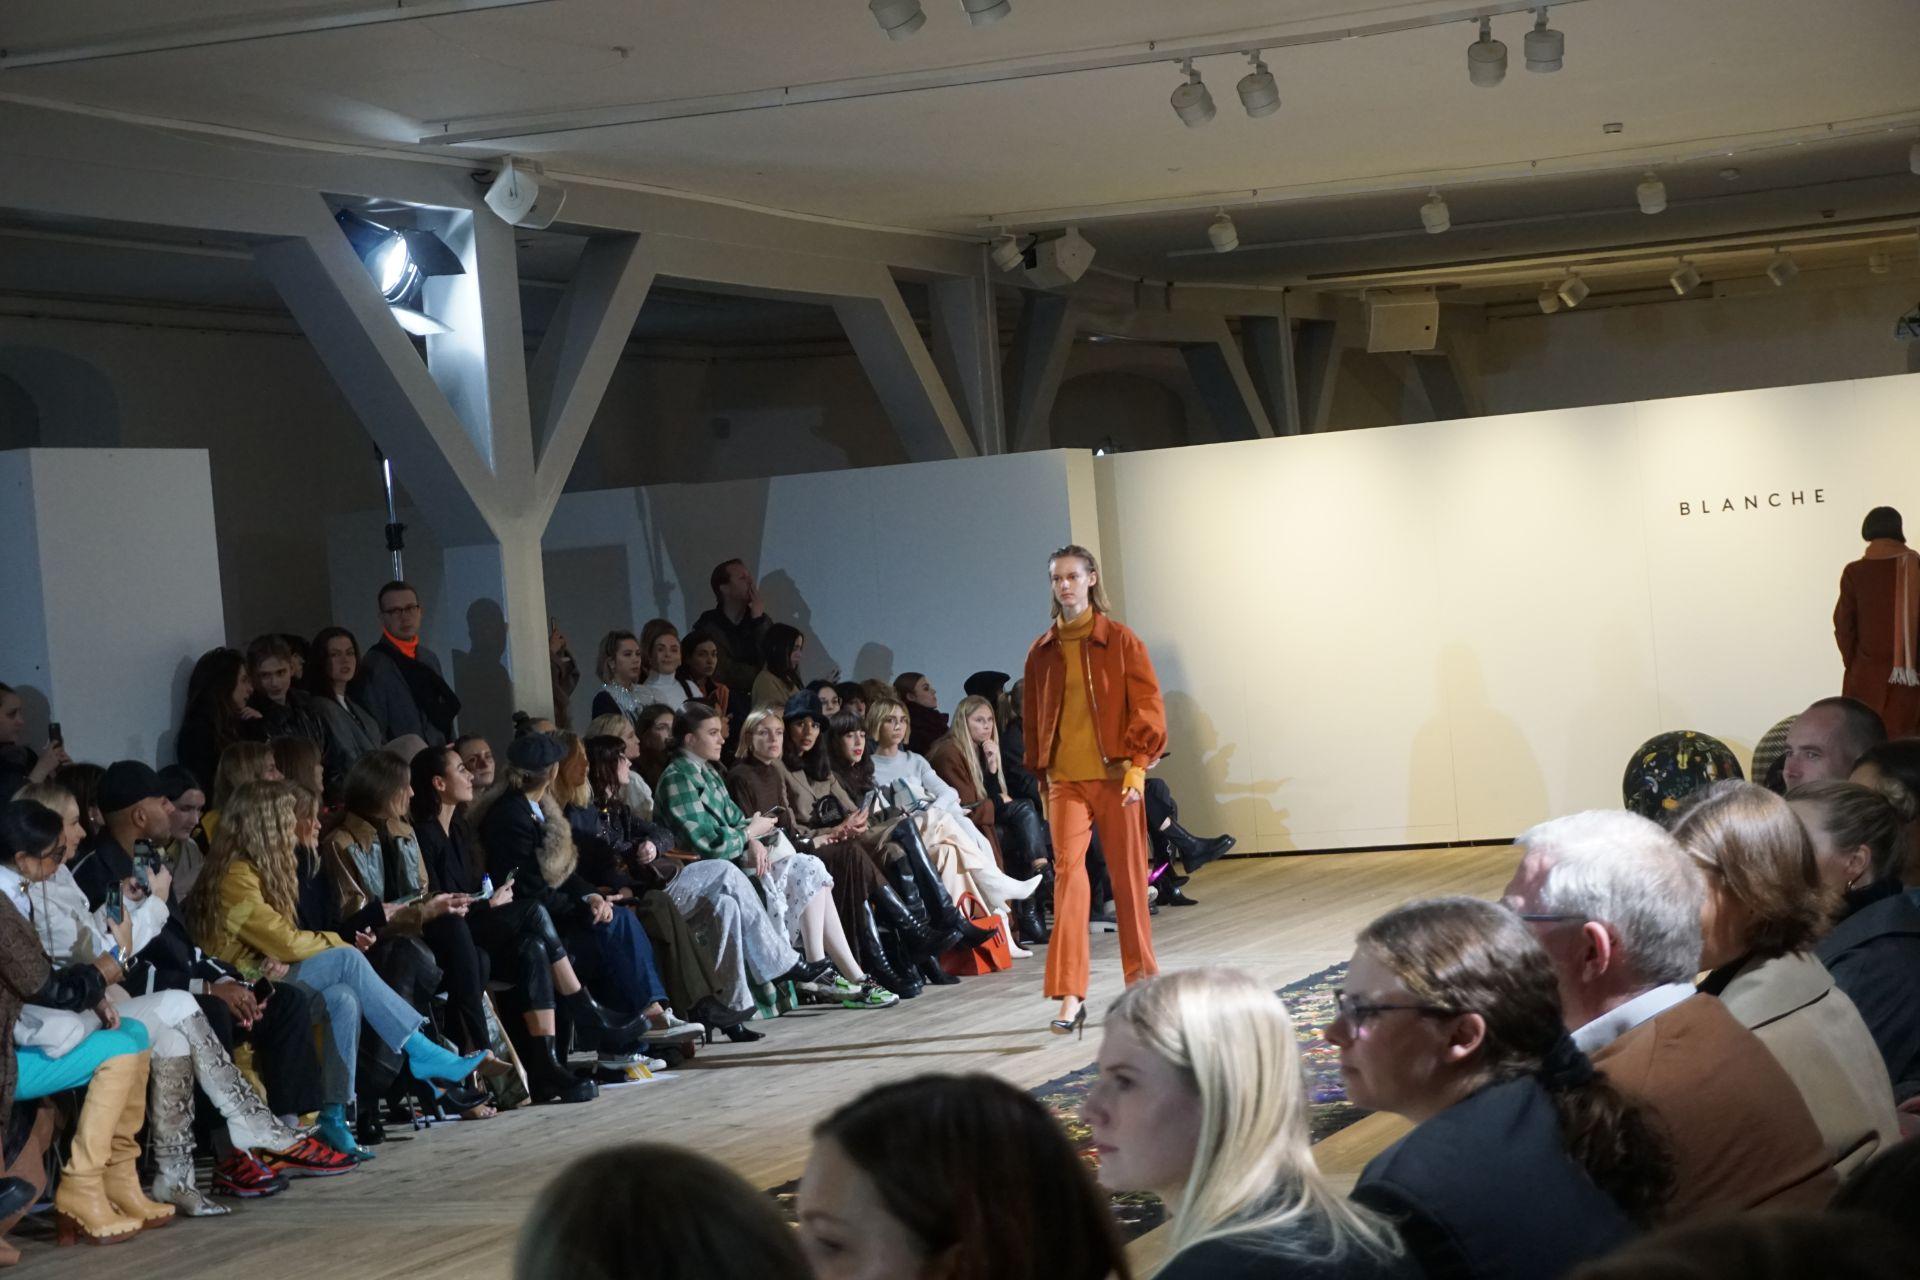 blanche copenhagen fashion show 17